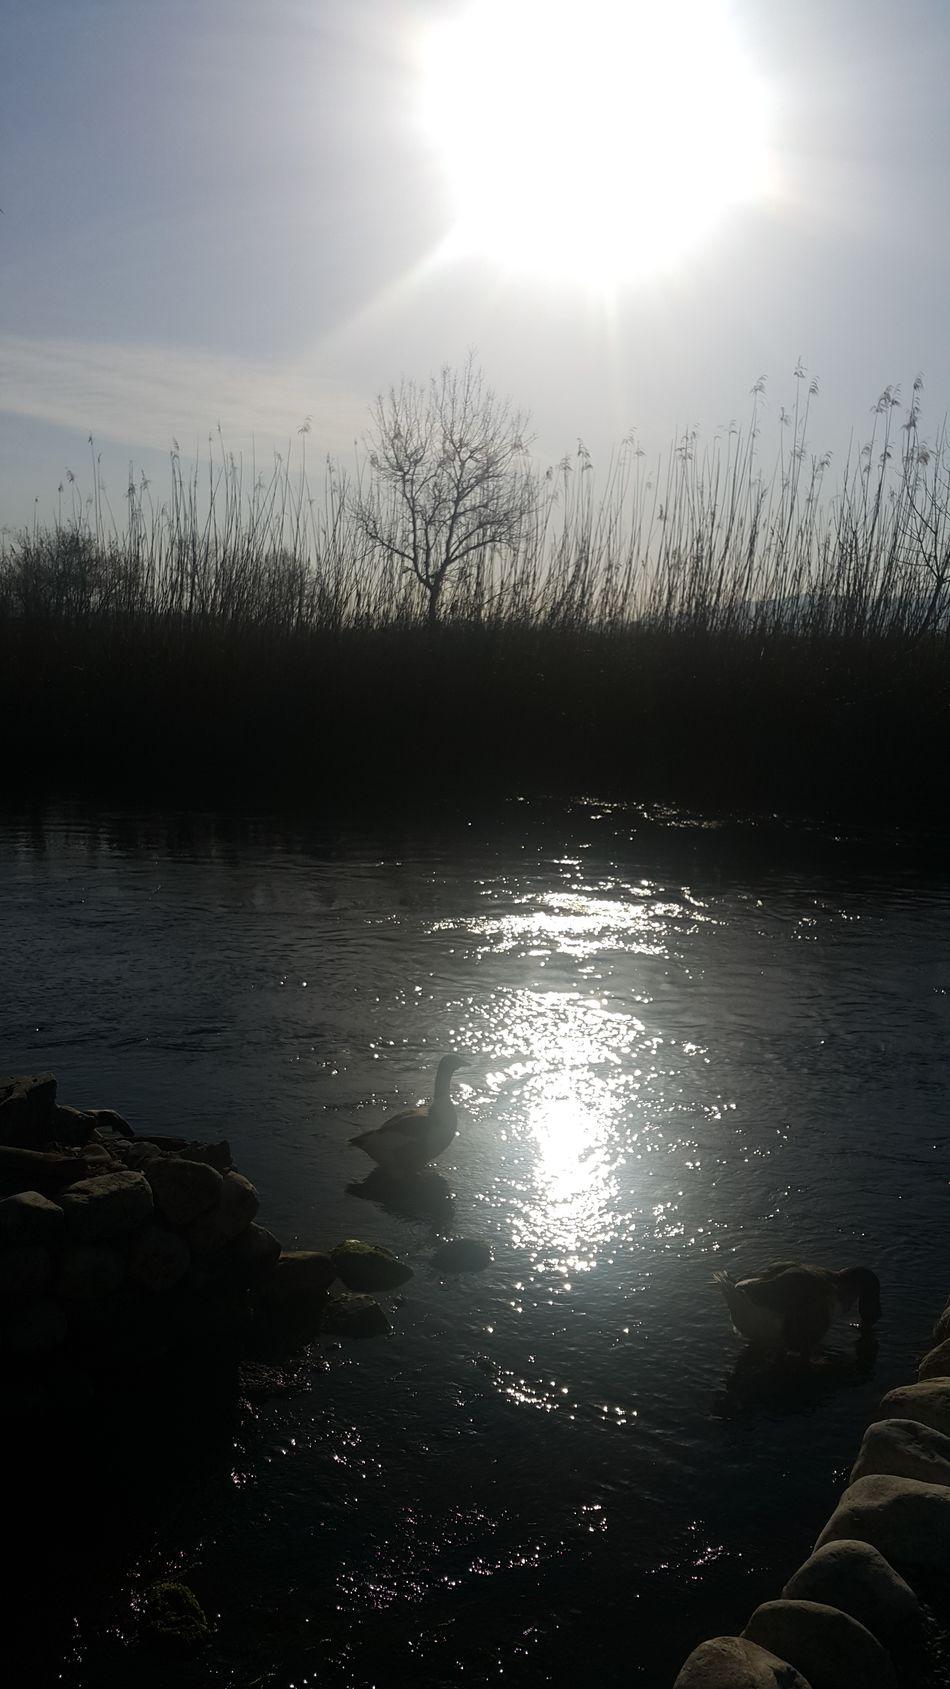 Phosphorescence Goose Morning Sunrise River Riverscape Nature Photography Reeds No Filter No Edit where Akyaka